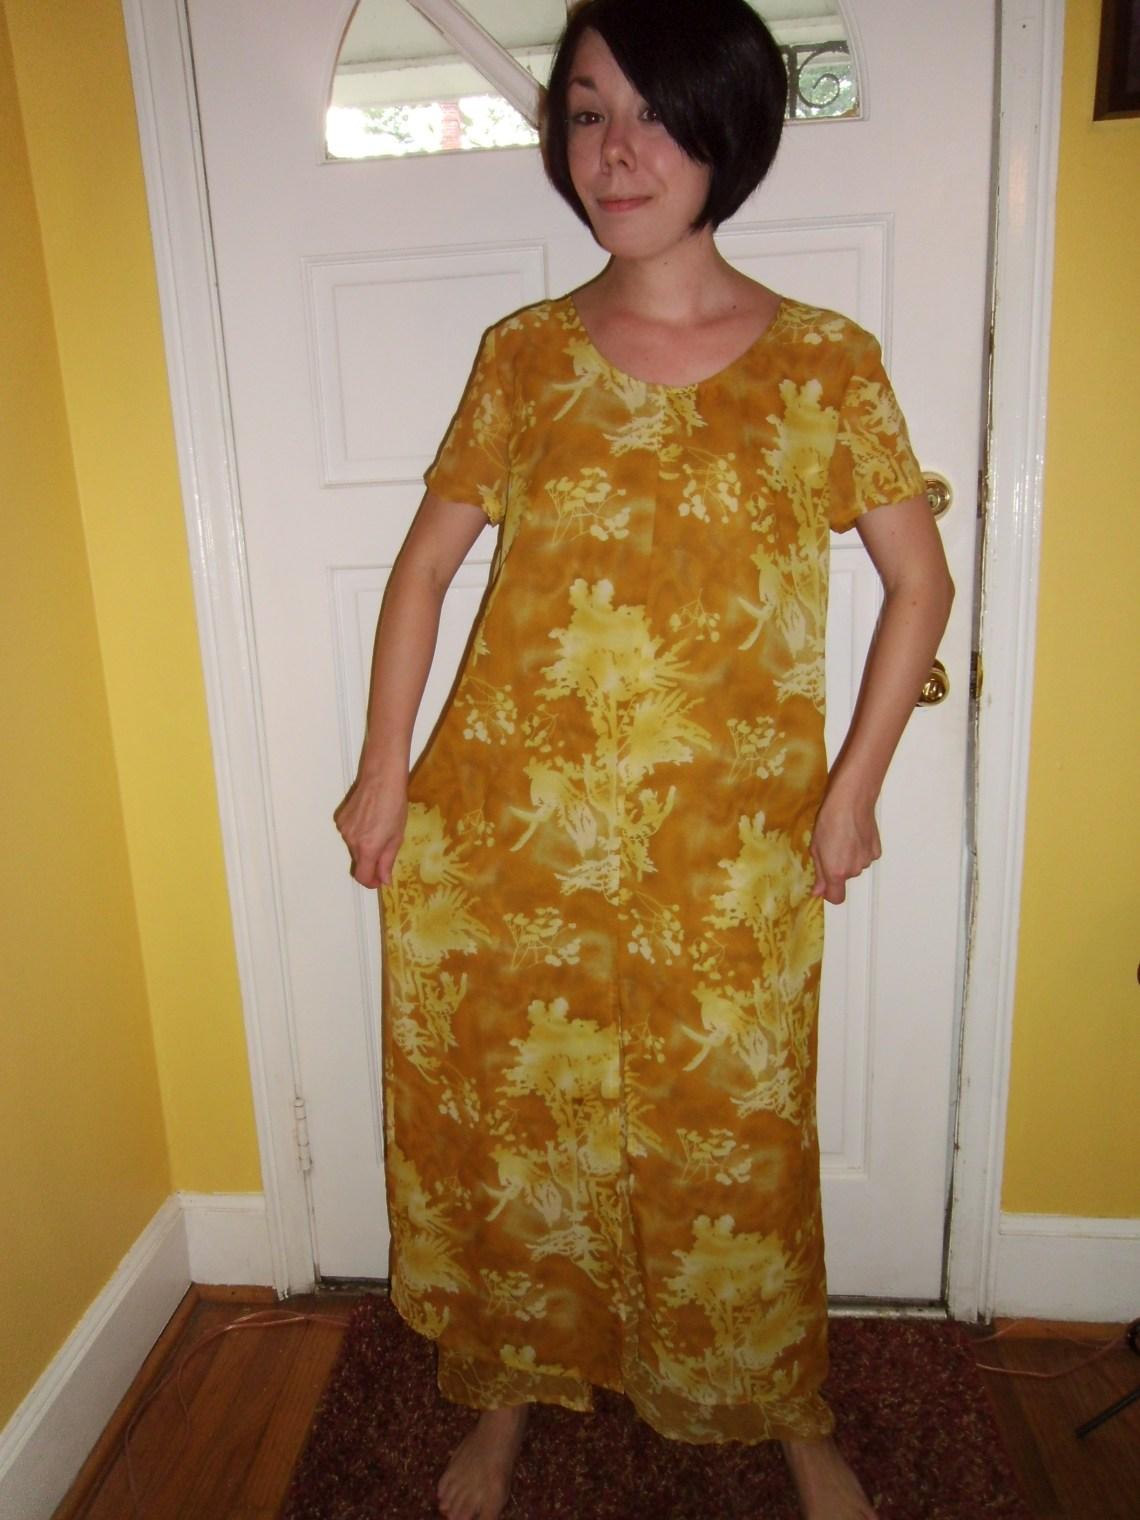 Day 64: Marigold Dress & The Nana Giveaway Winner! 1